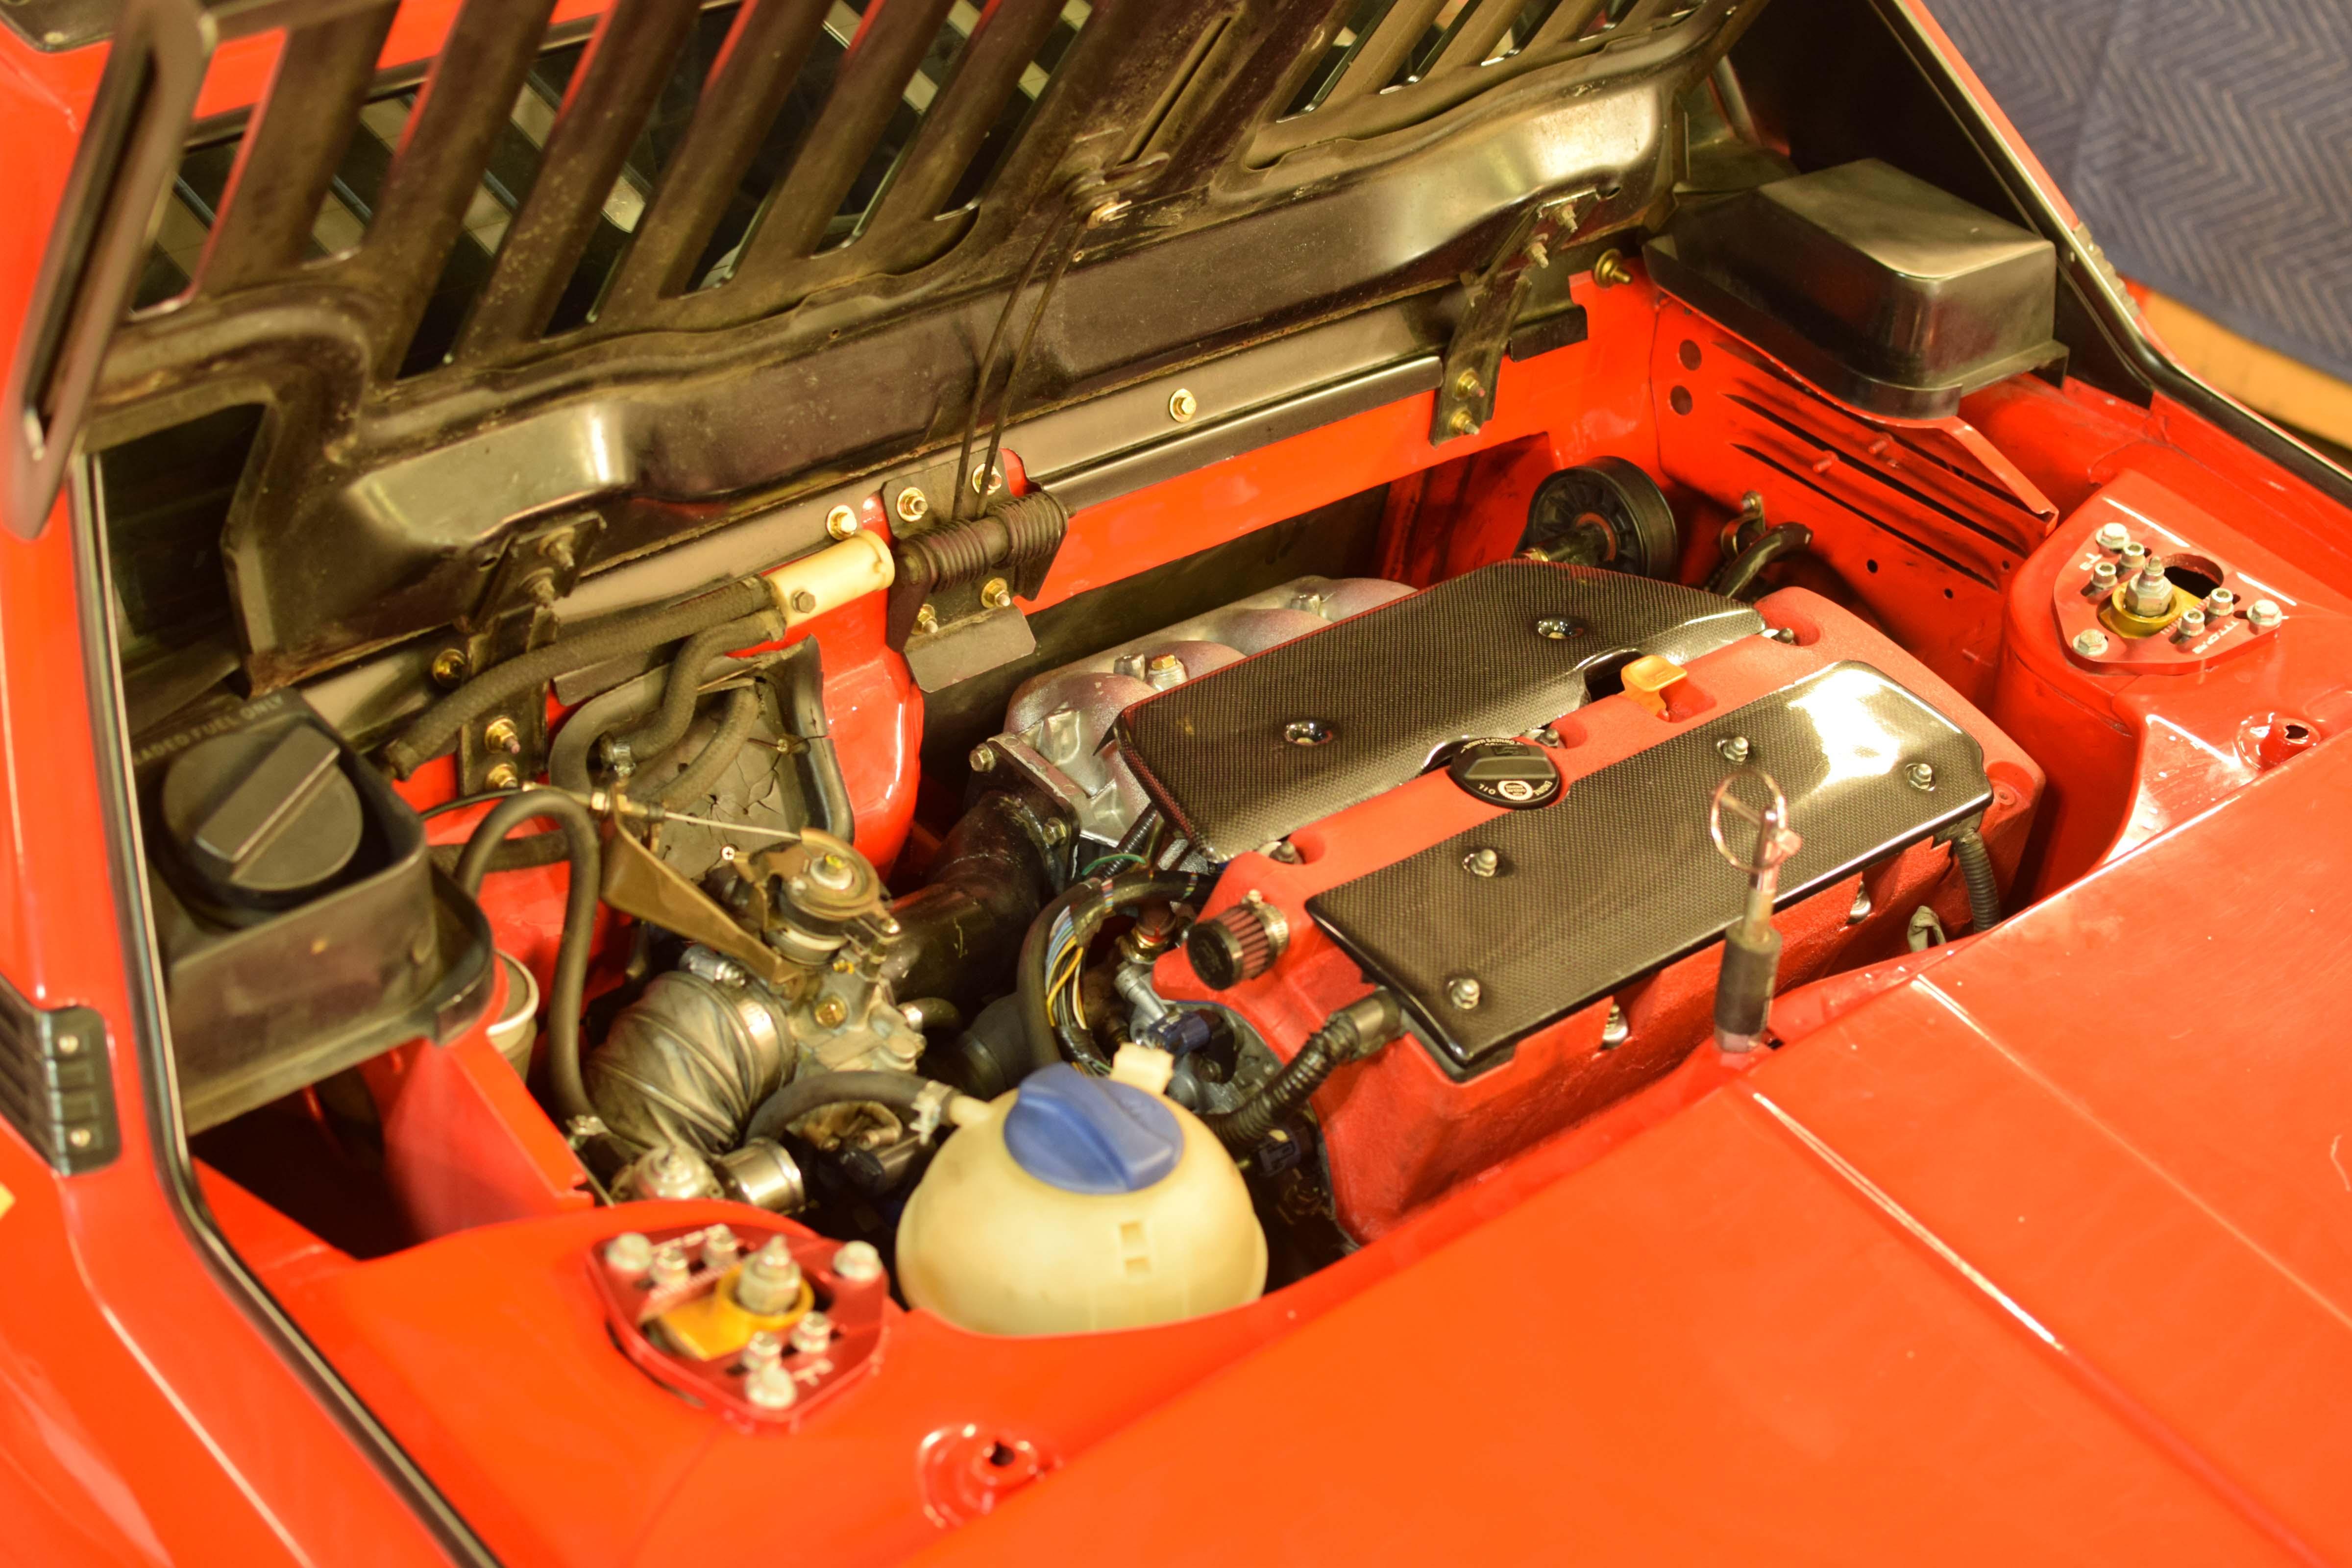 fiat x1/9 engine red car